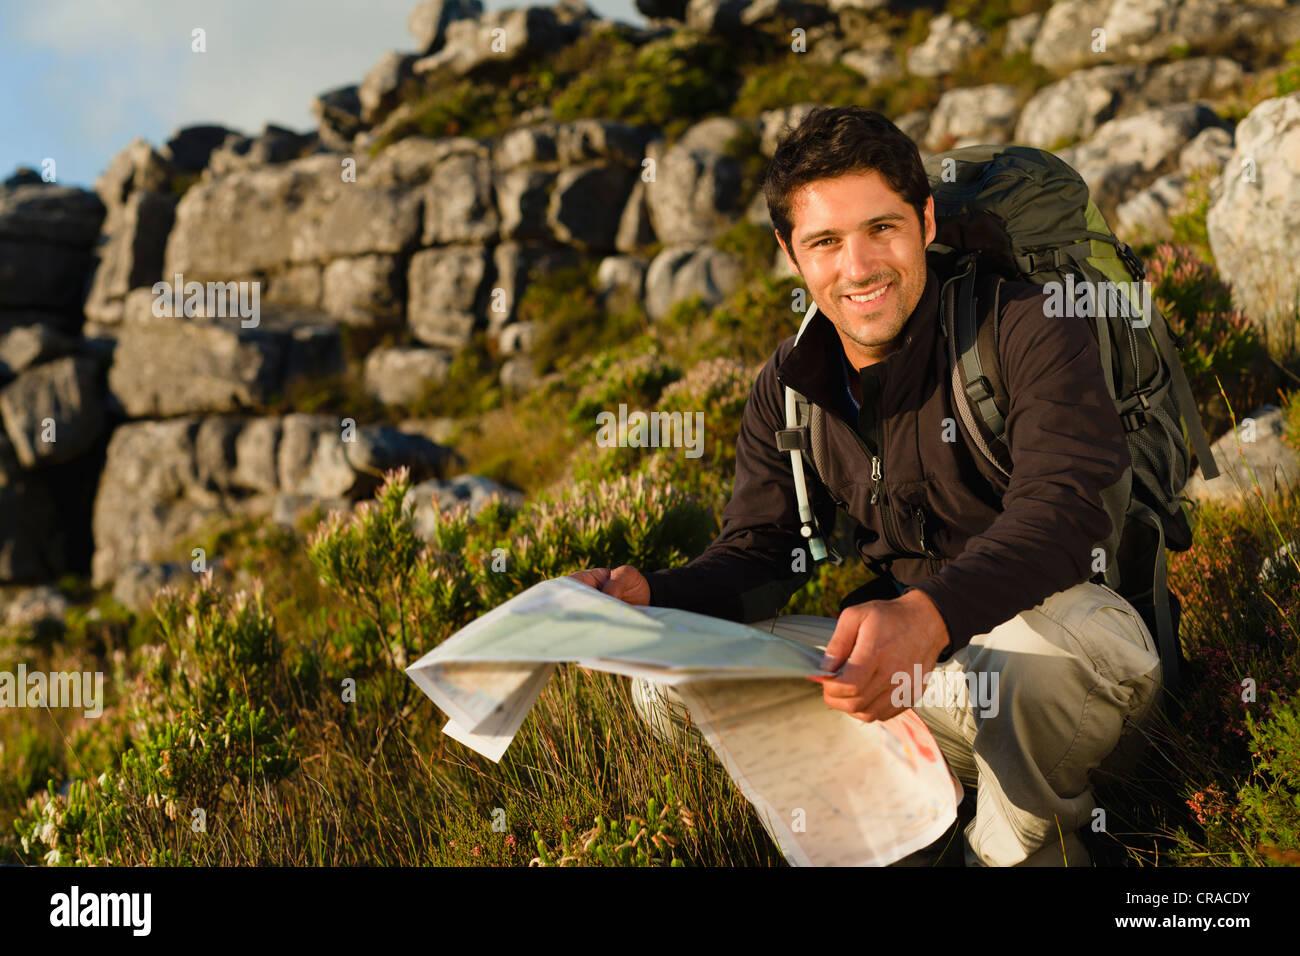 Hiker reading map in rocky field - Stock Image